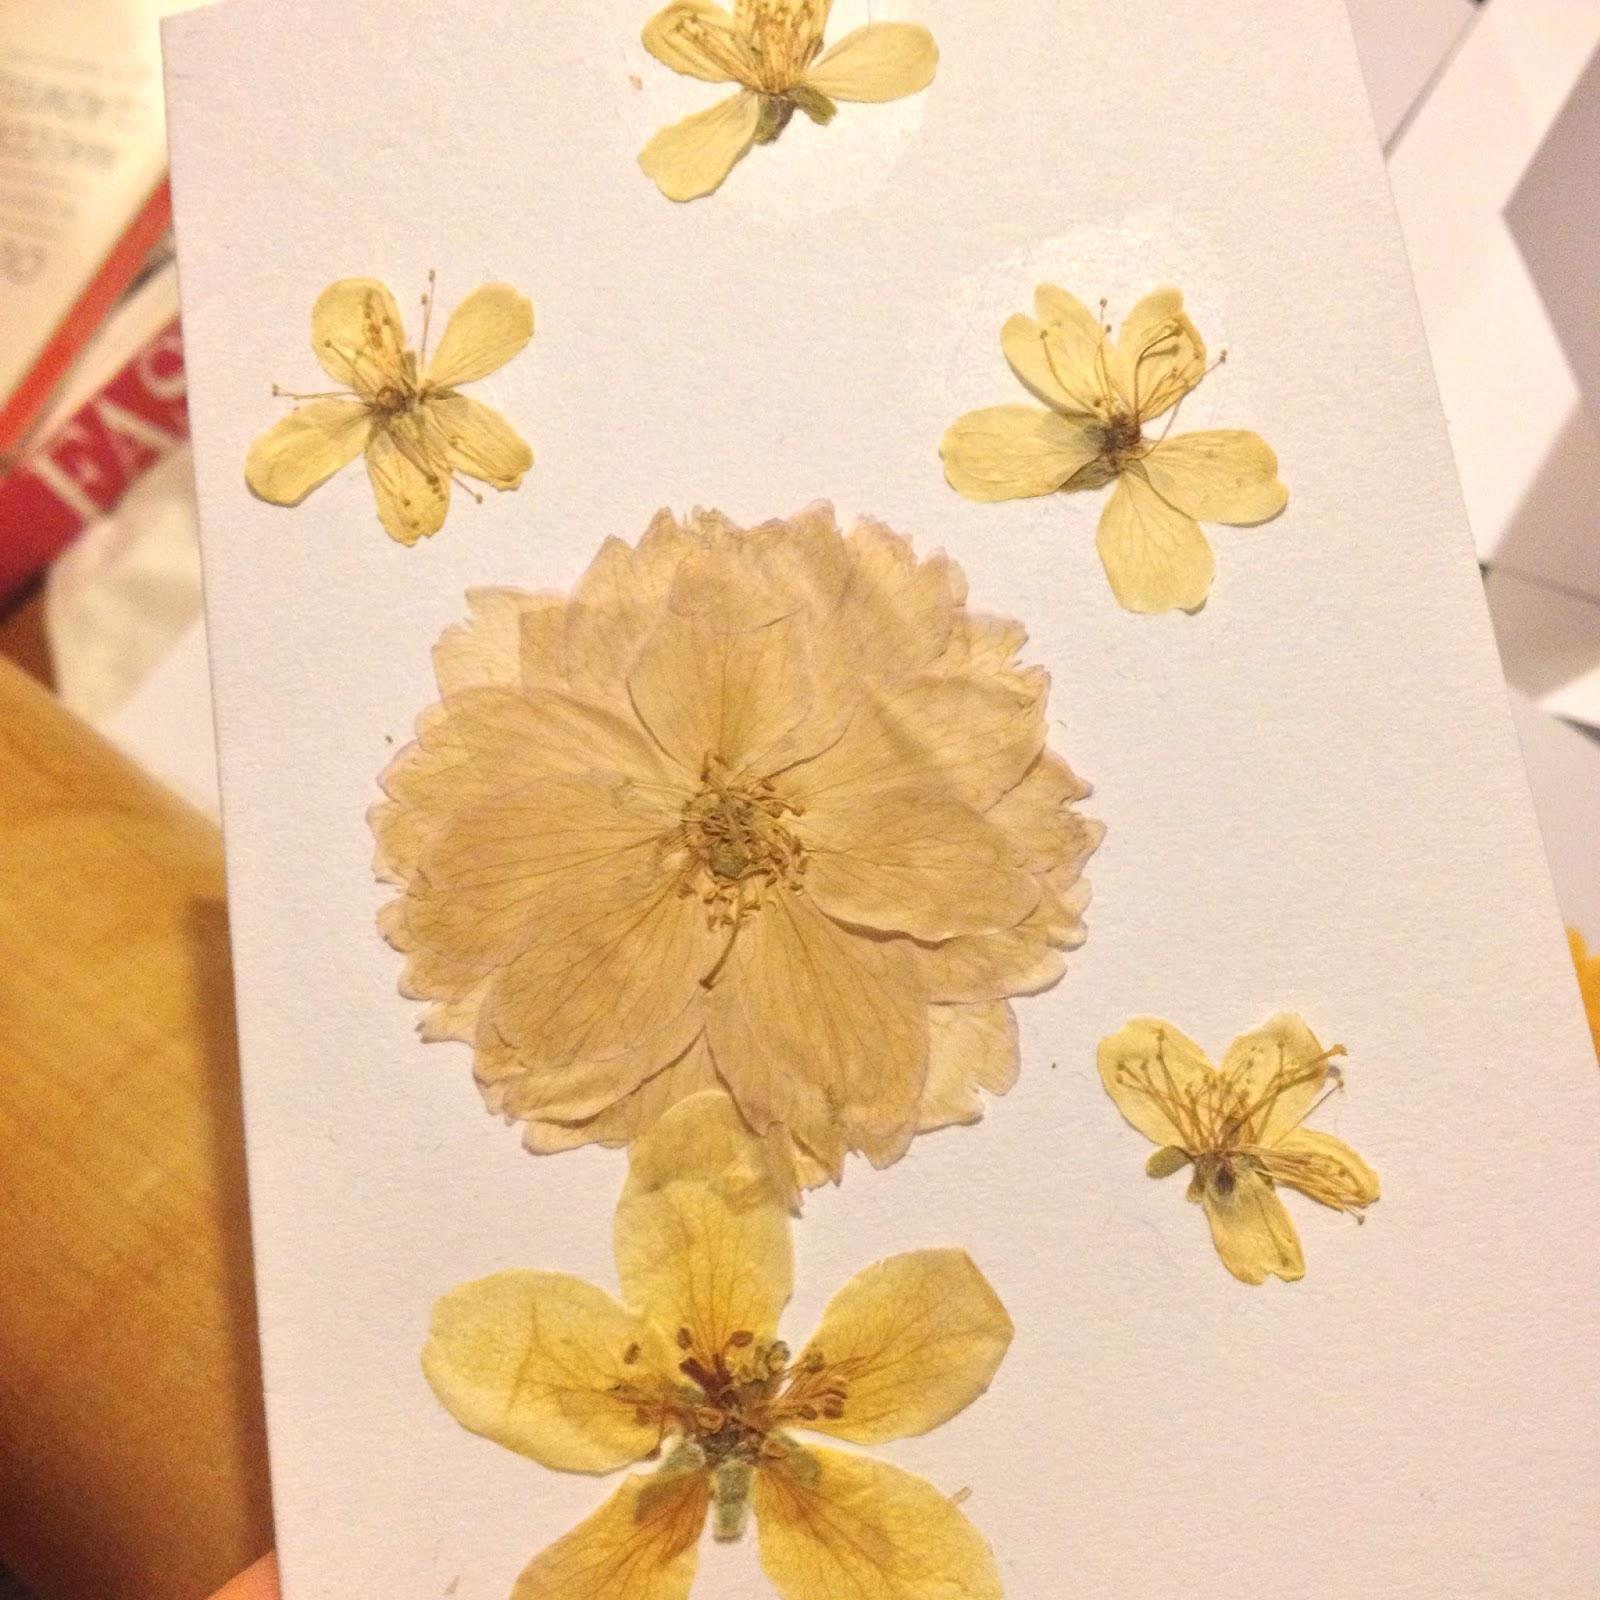 Spring Flower Pressing Jojos Knitting Emporium